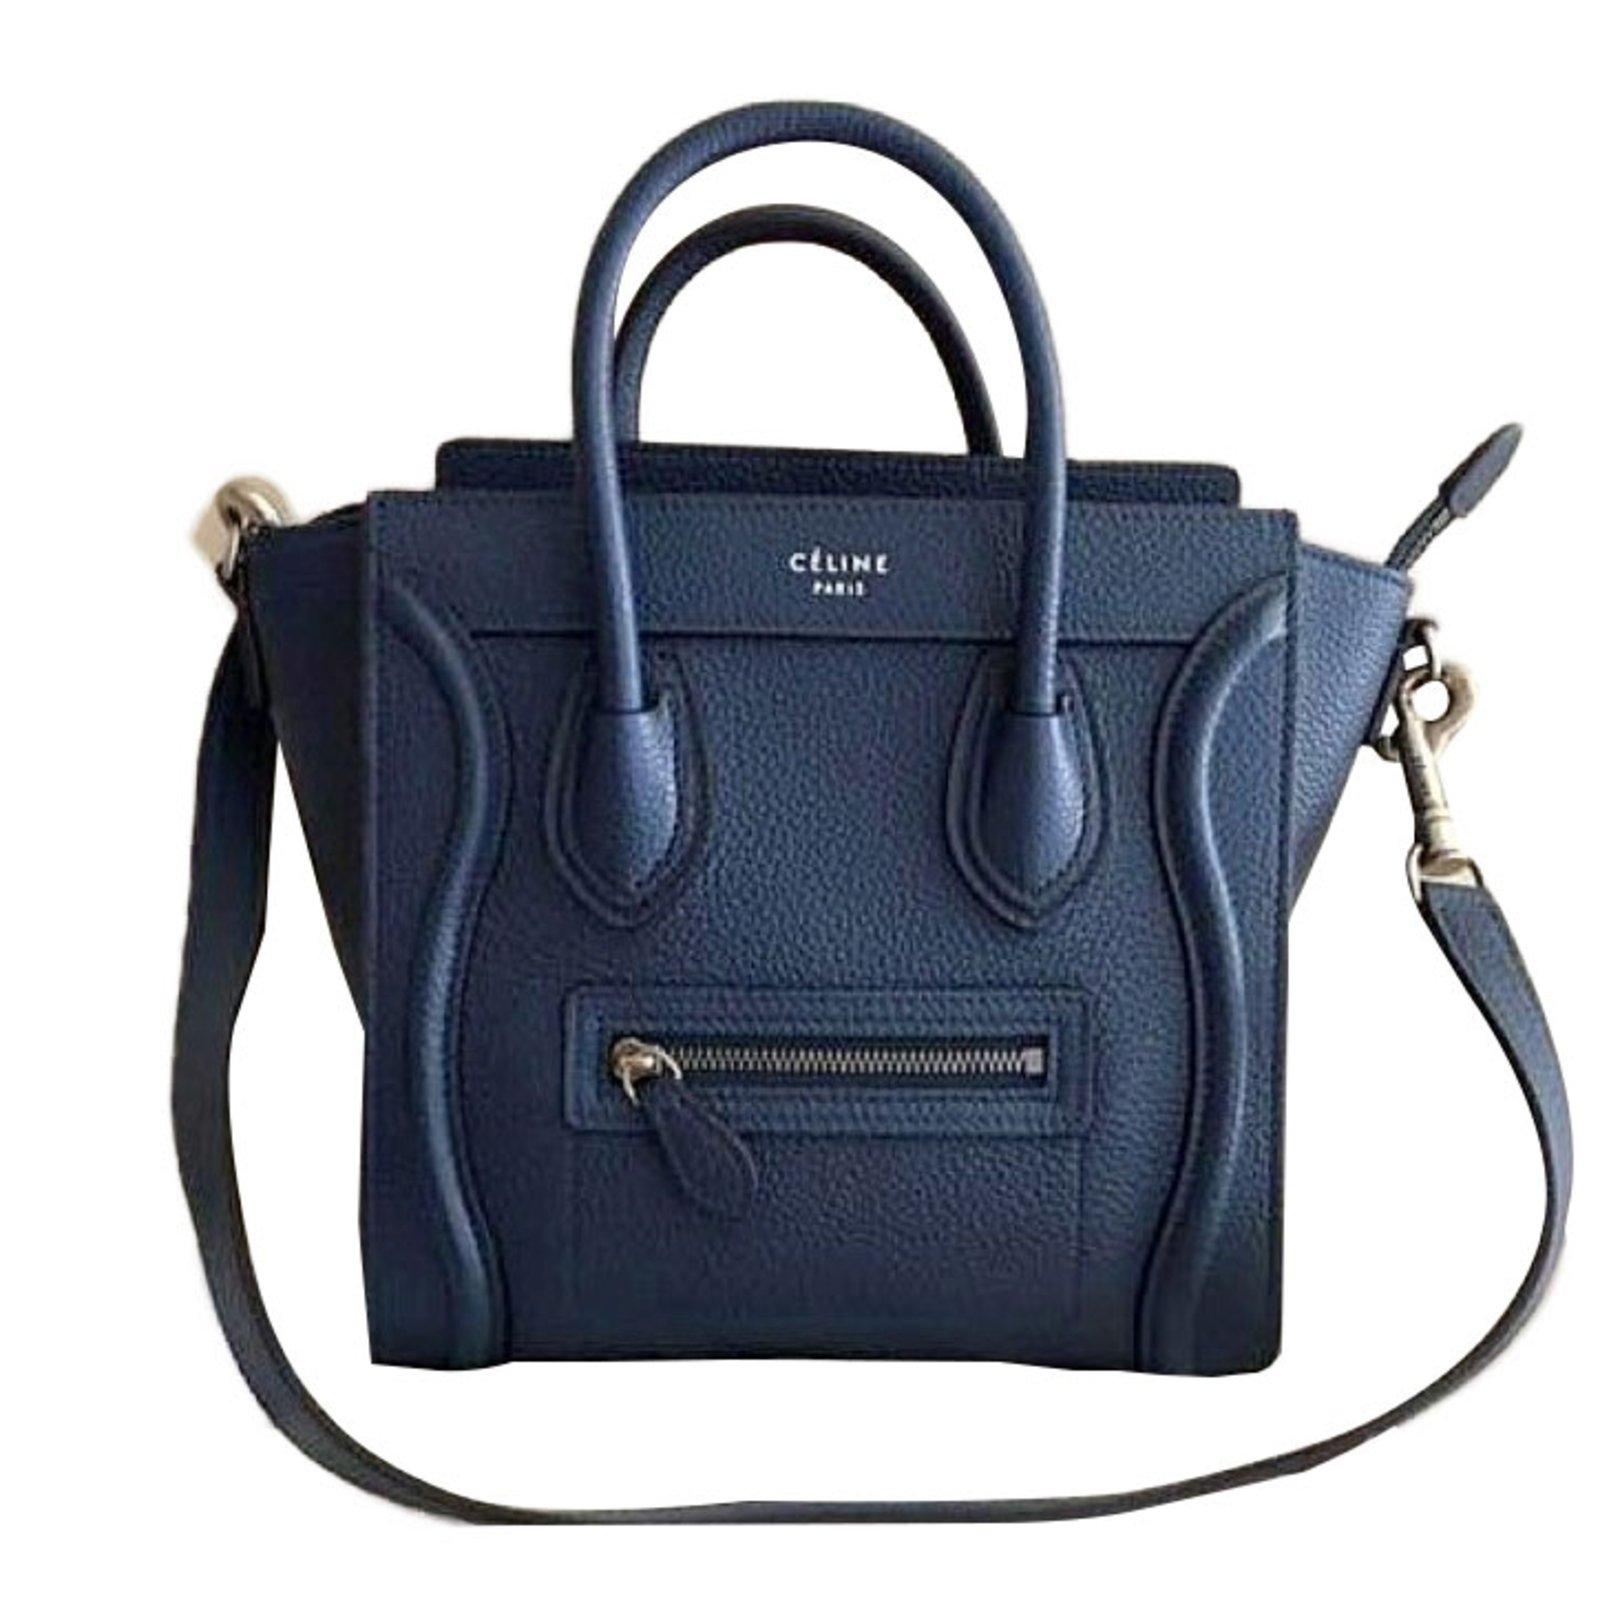 Céline Handbag Handbags Leather Navy Blue Ref 44933